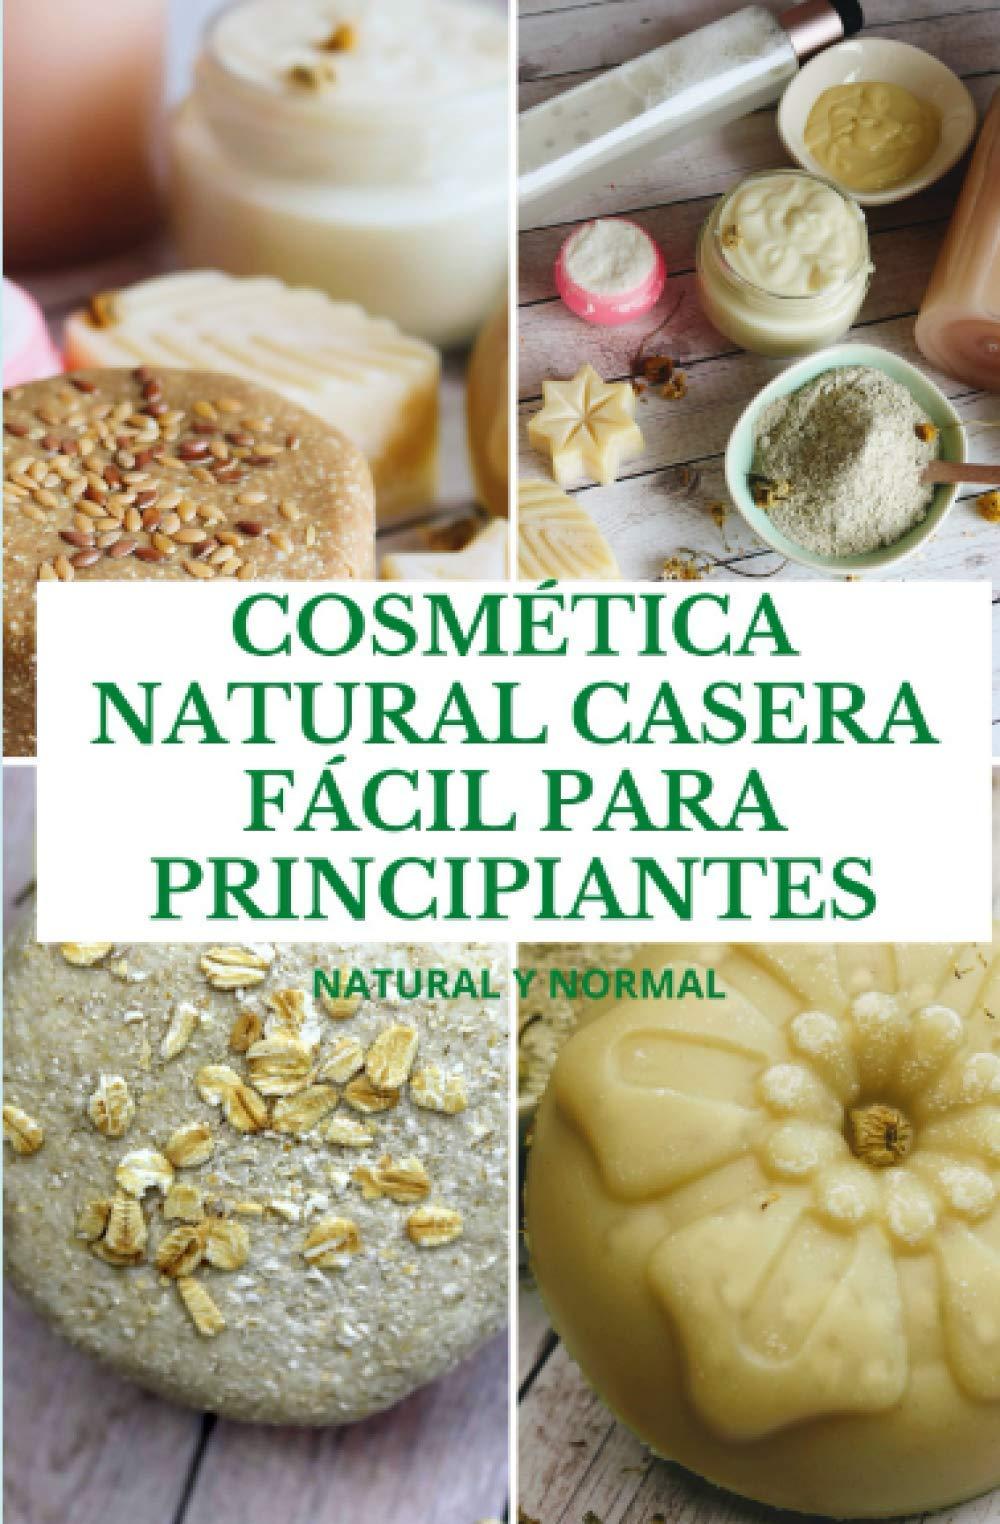 COSMÉTICA NATURAL CASERA FÁCIL PARA